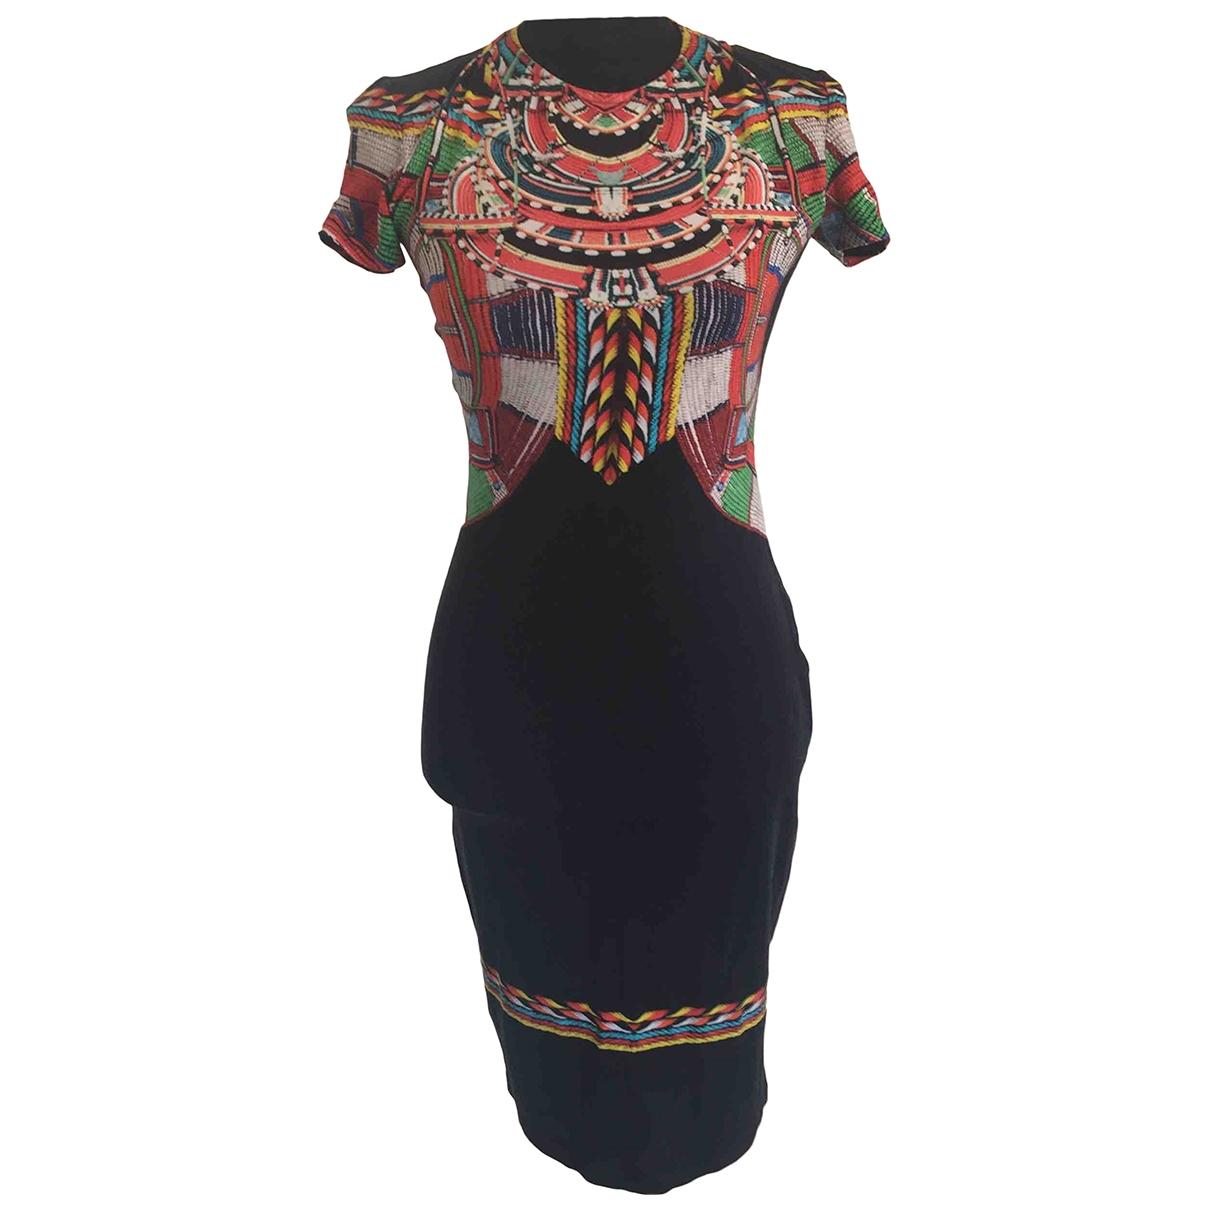 Givenchy \N Multicolour Cotton - elasthane dress for Women S International